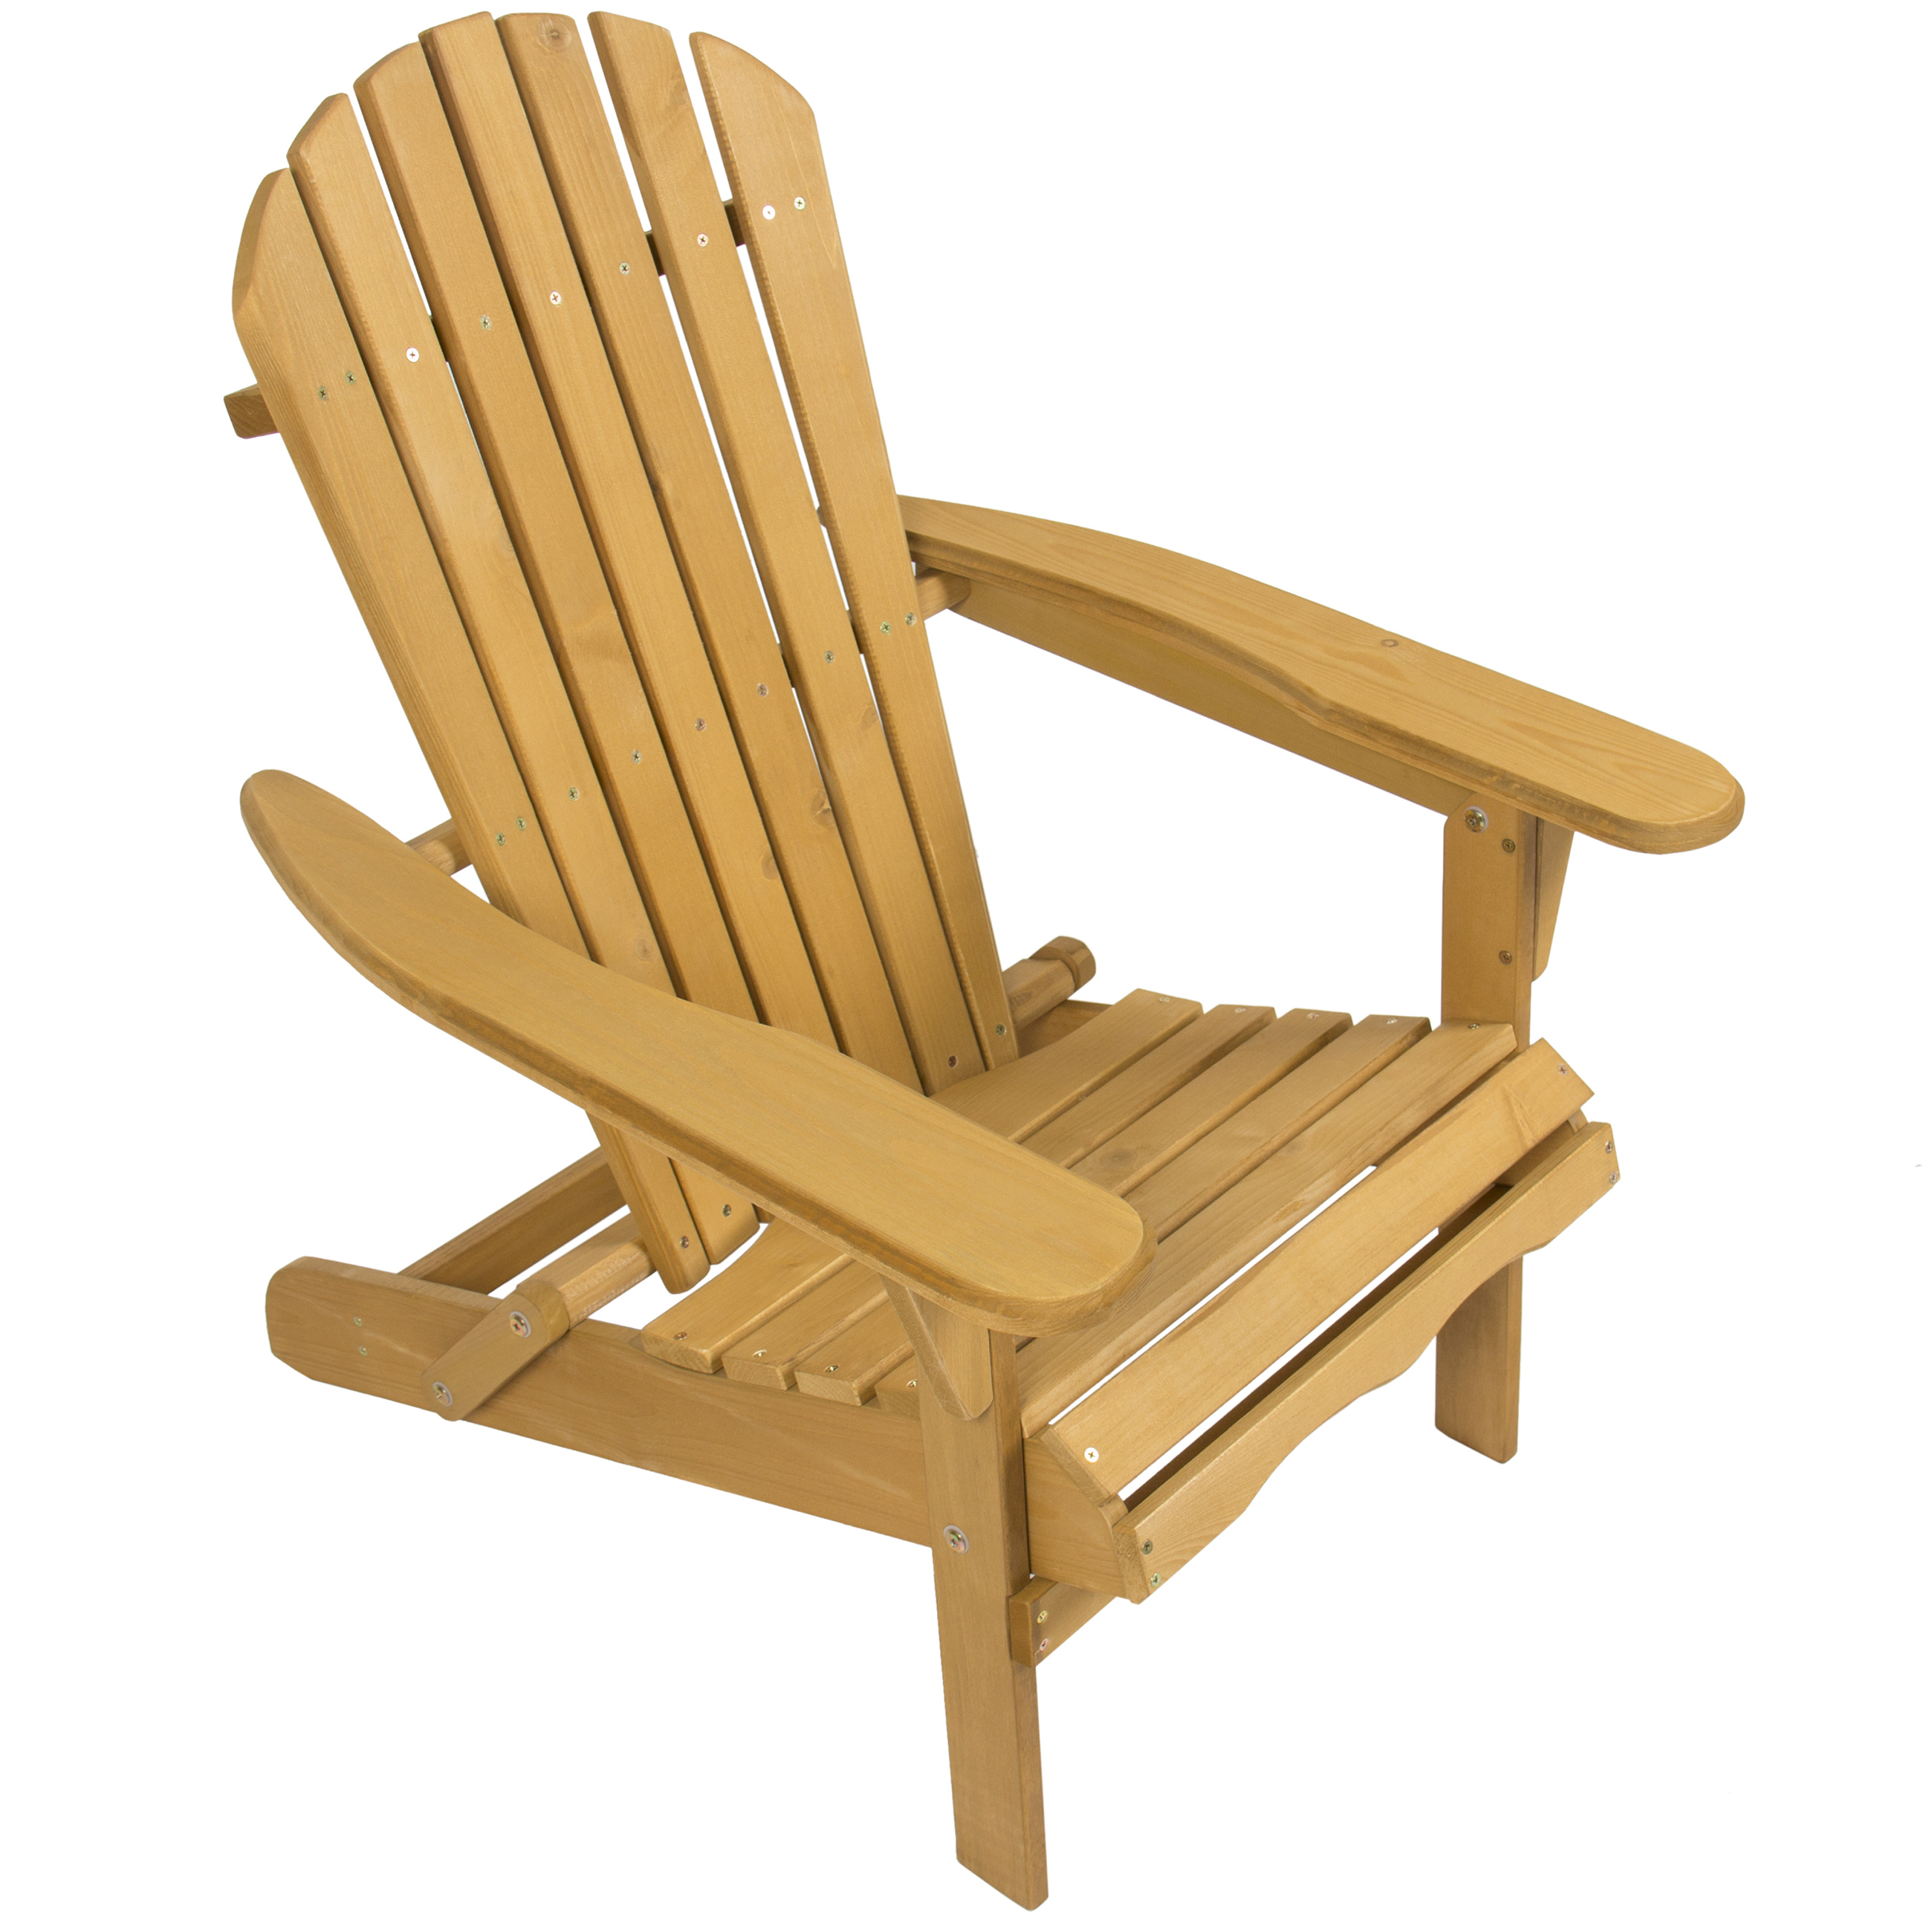 Bcp Foldable Wooden Adirondack Chair Natural Finish Ebay